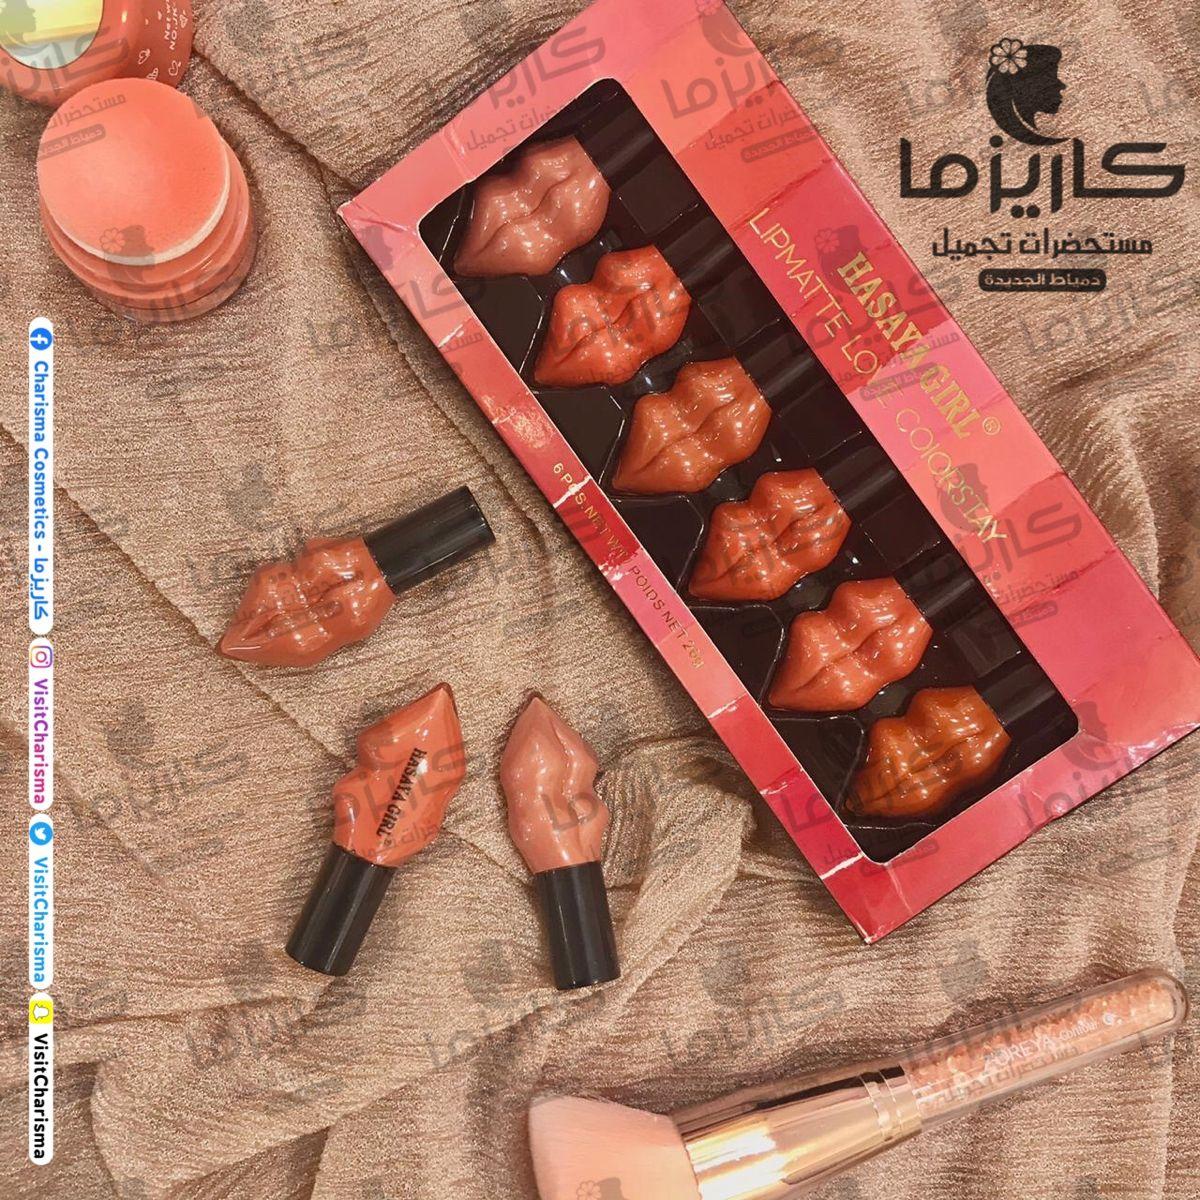 Pin On Charisma Cosmetics كاريزما